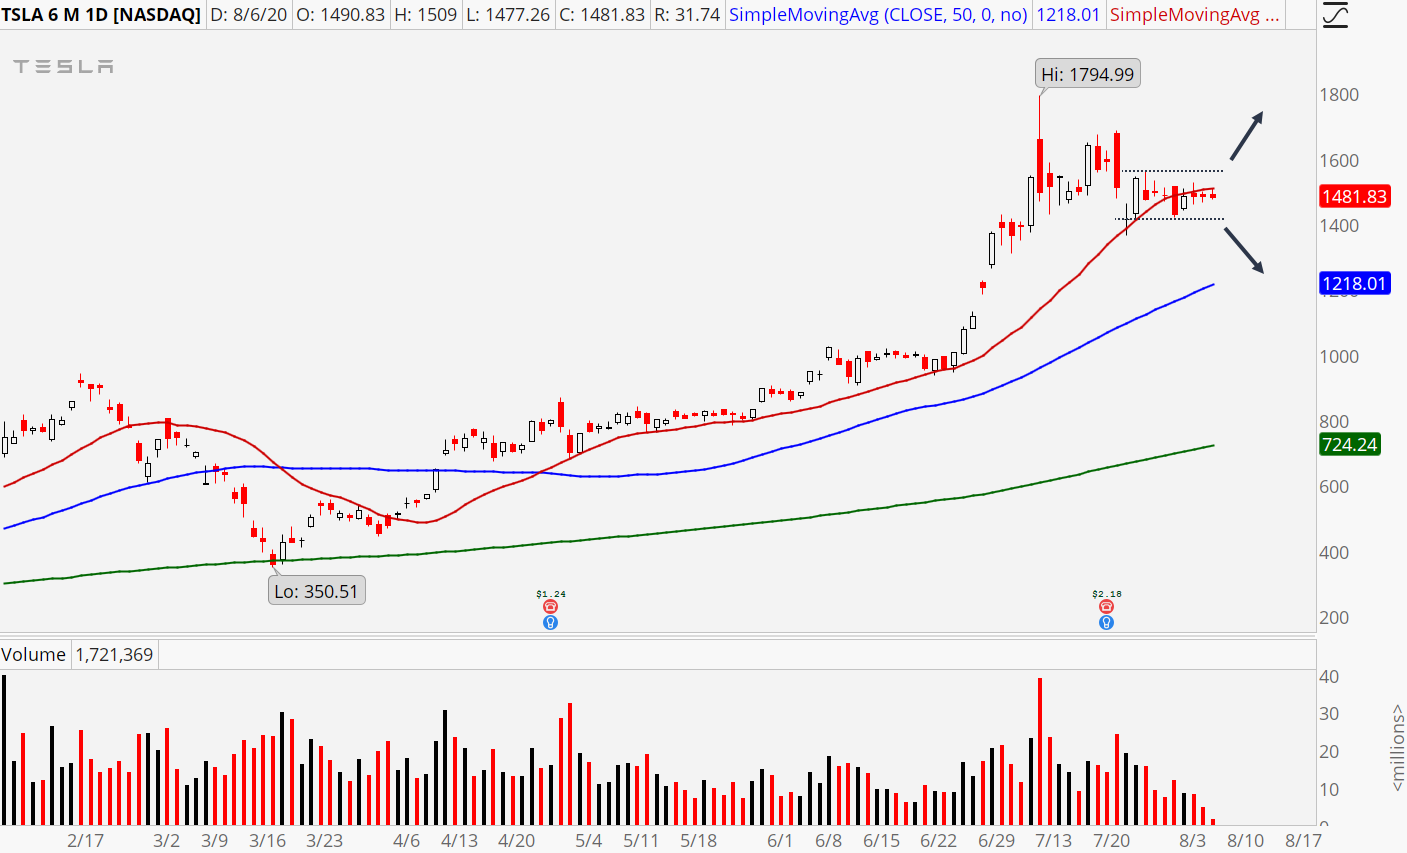 Tesla (TSLA) daily chart showing consolidation breakout setup